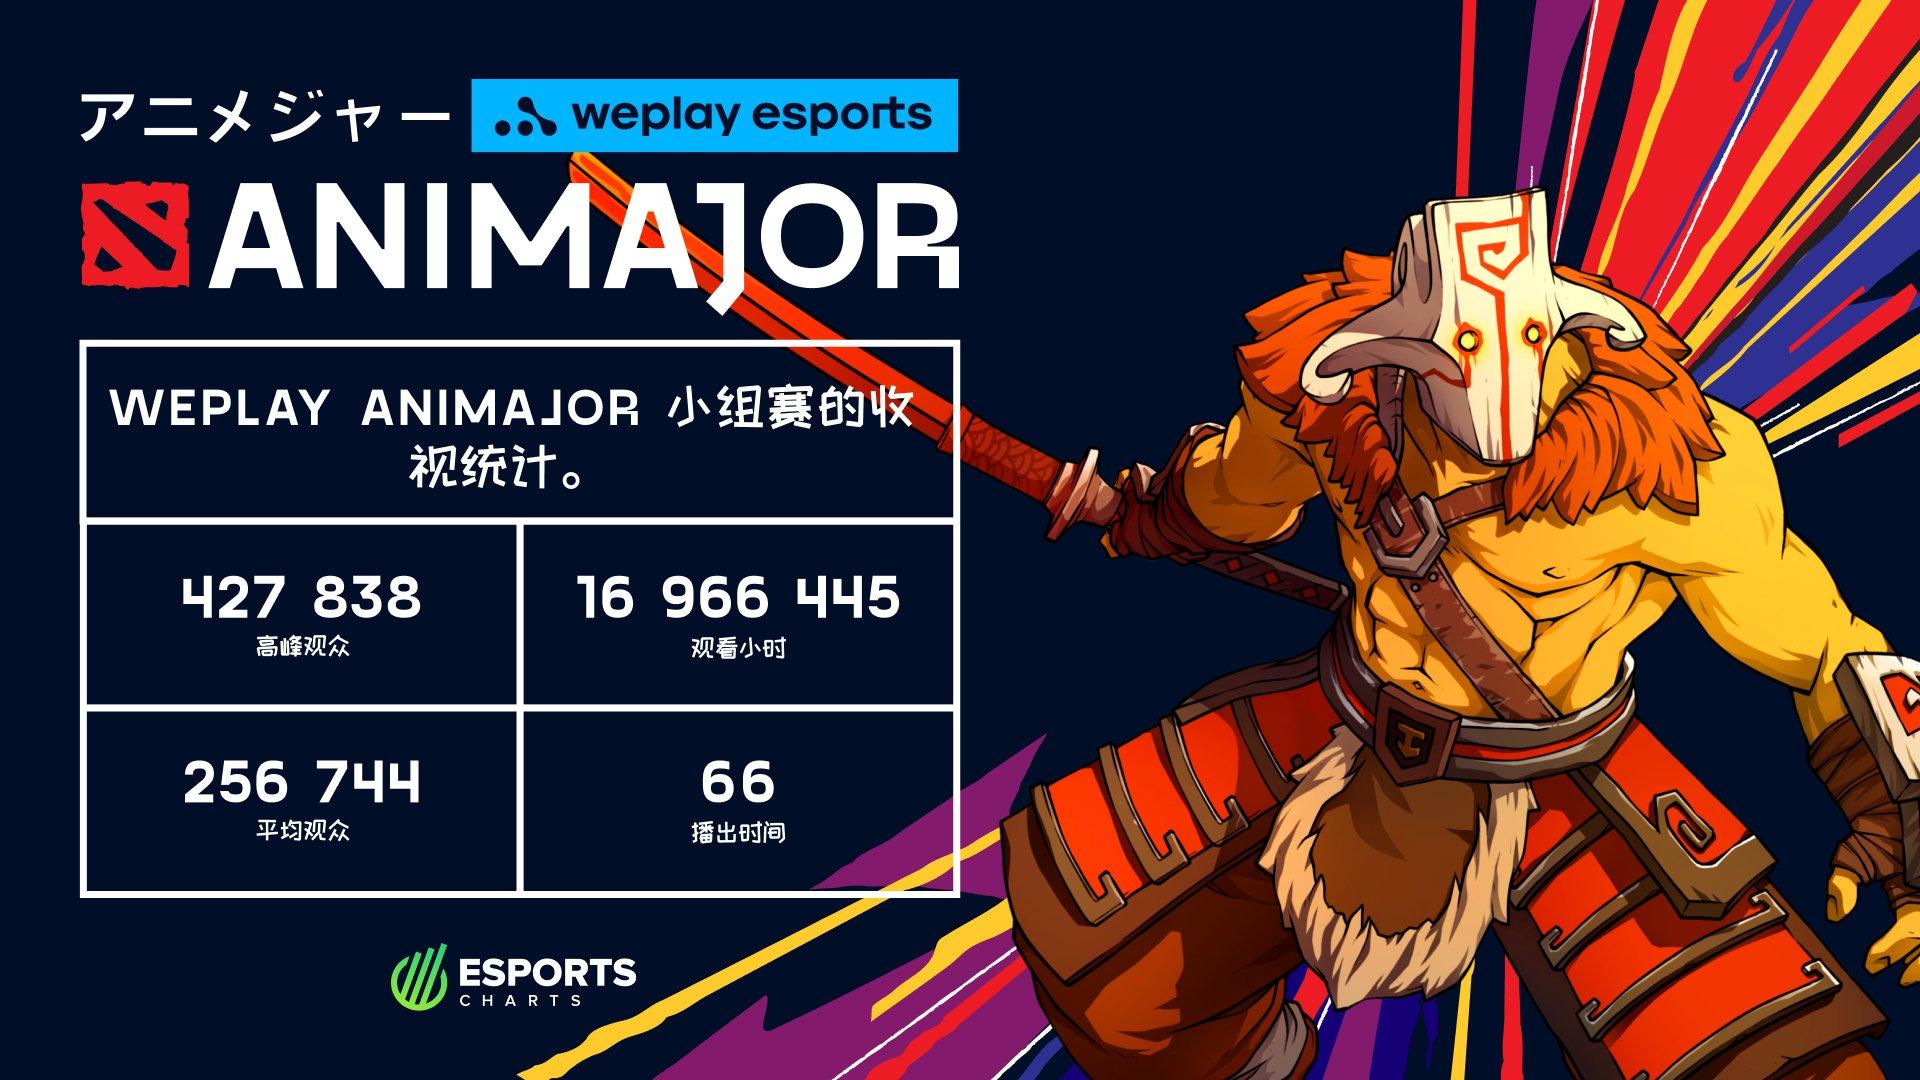 WePlay AniMajor 小组赛的收视统计。  图象:WePlay Esports